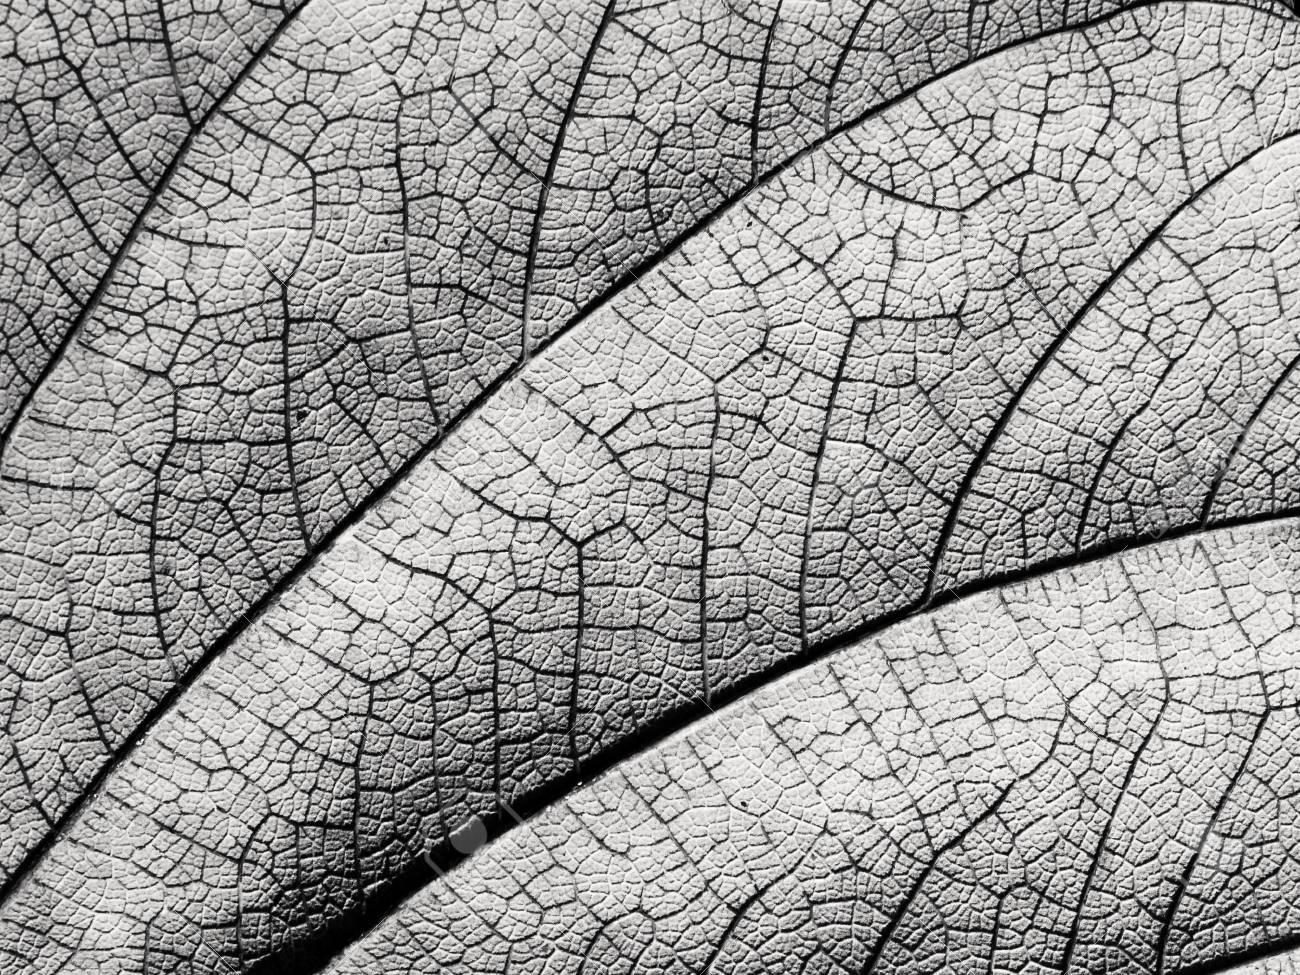 Black and white leaf texture closeup